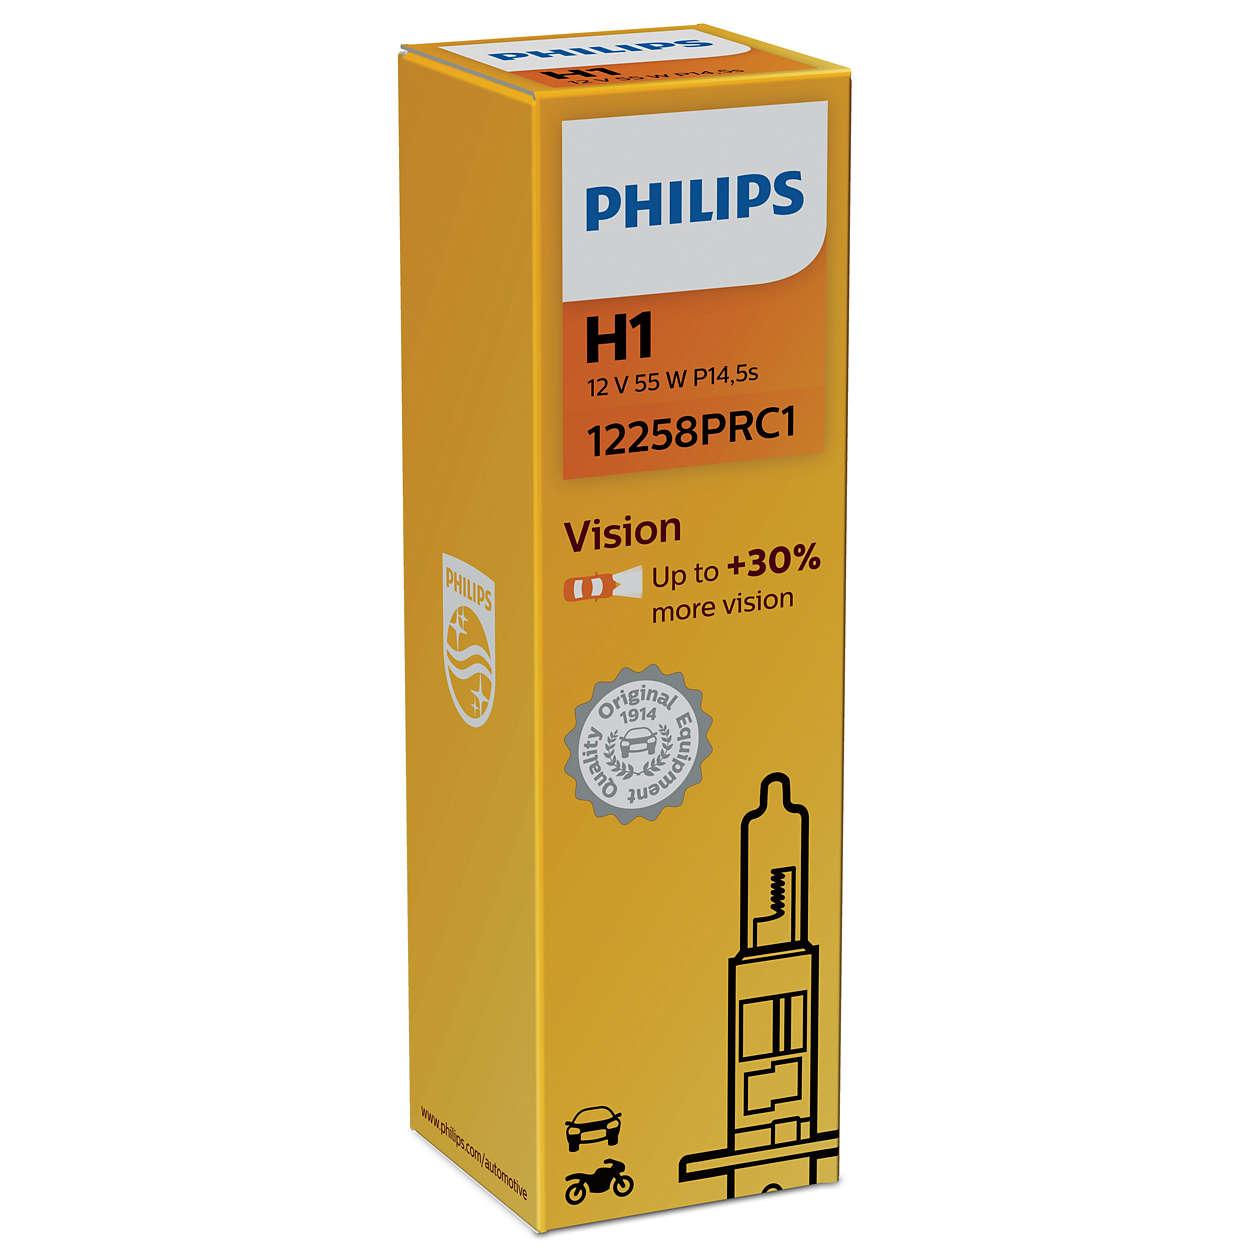 Philips Vision+30% 12258PRC1 H1 P14,5s 12V 55W